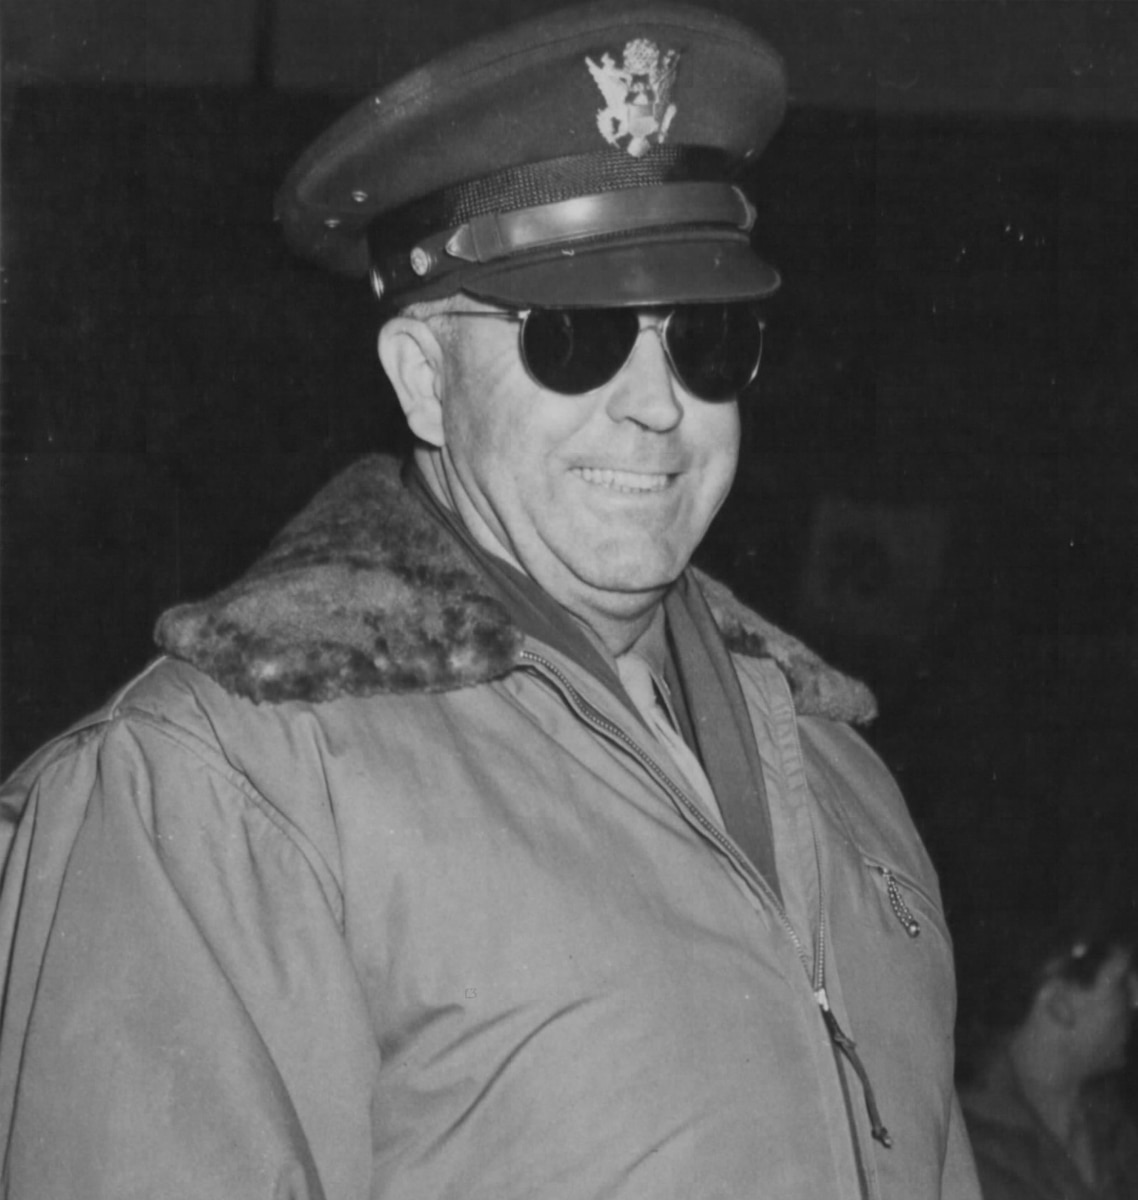 BRIGADIER GENERAL DALE VINCENT GAFFNEY